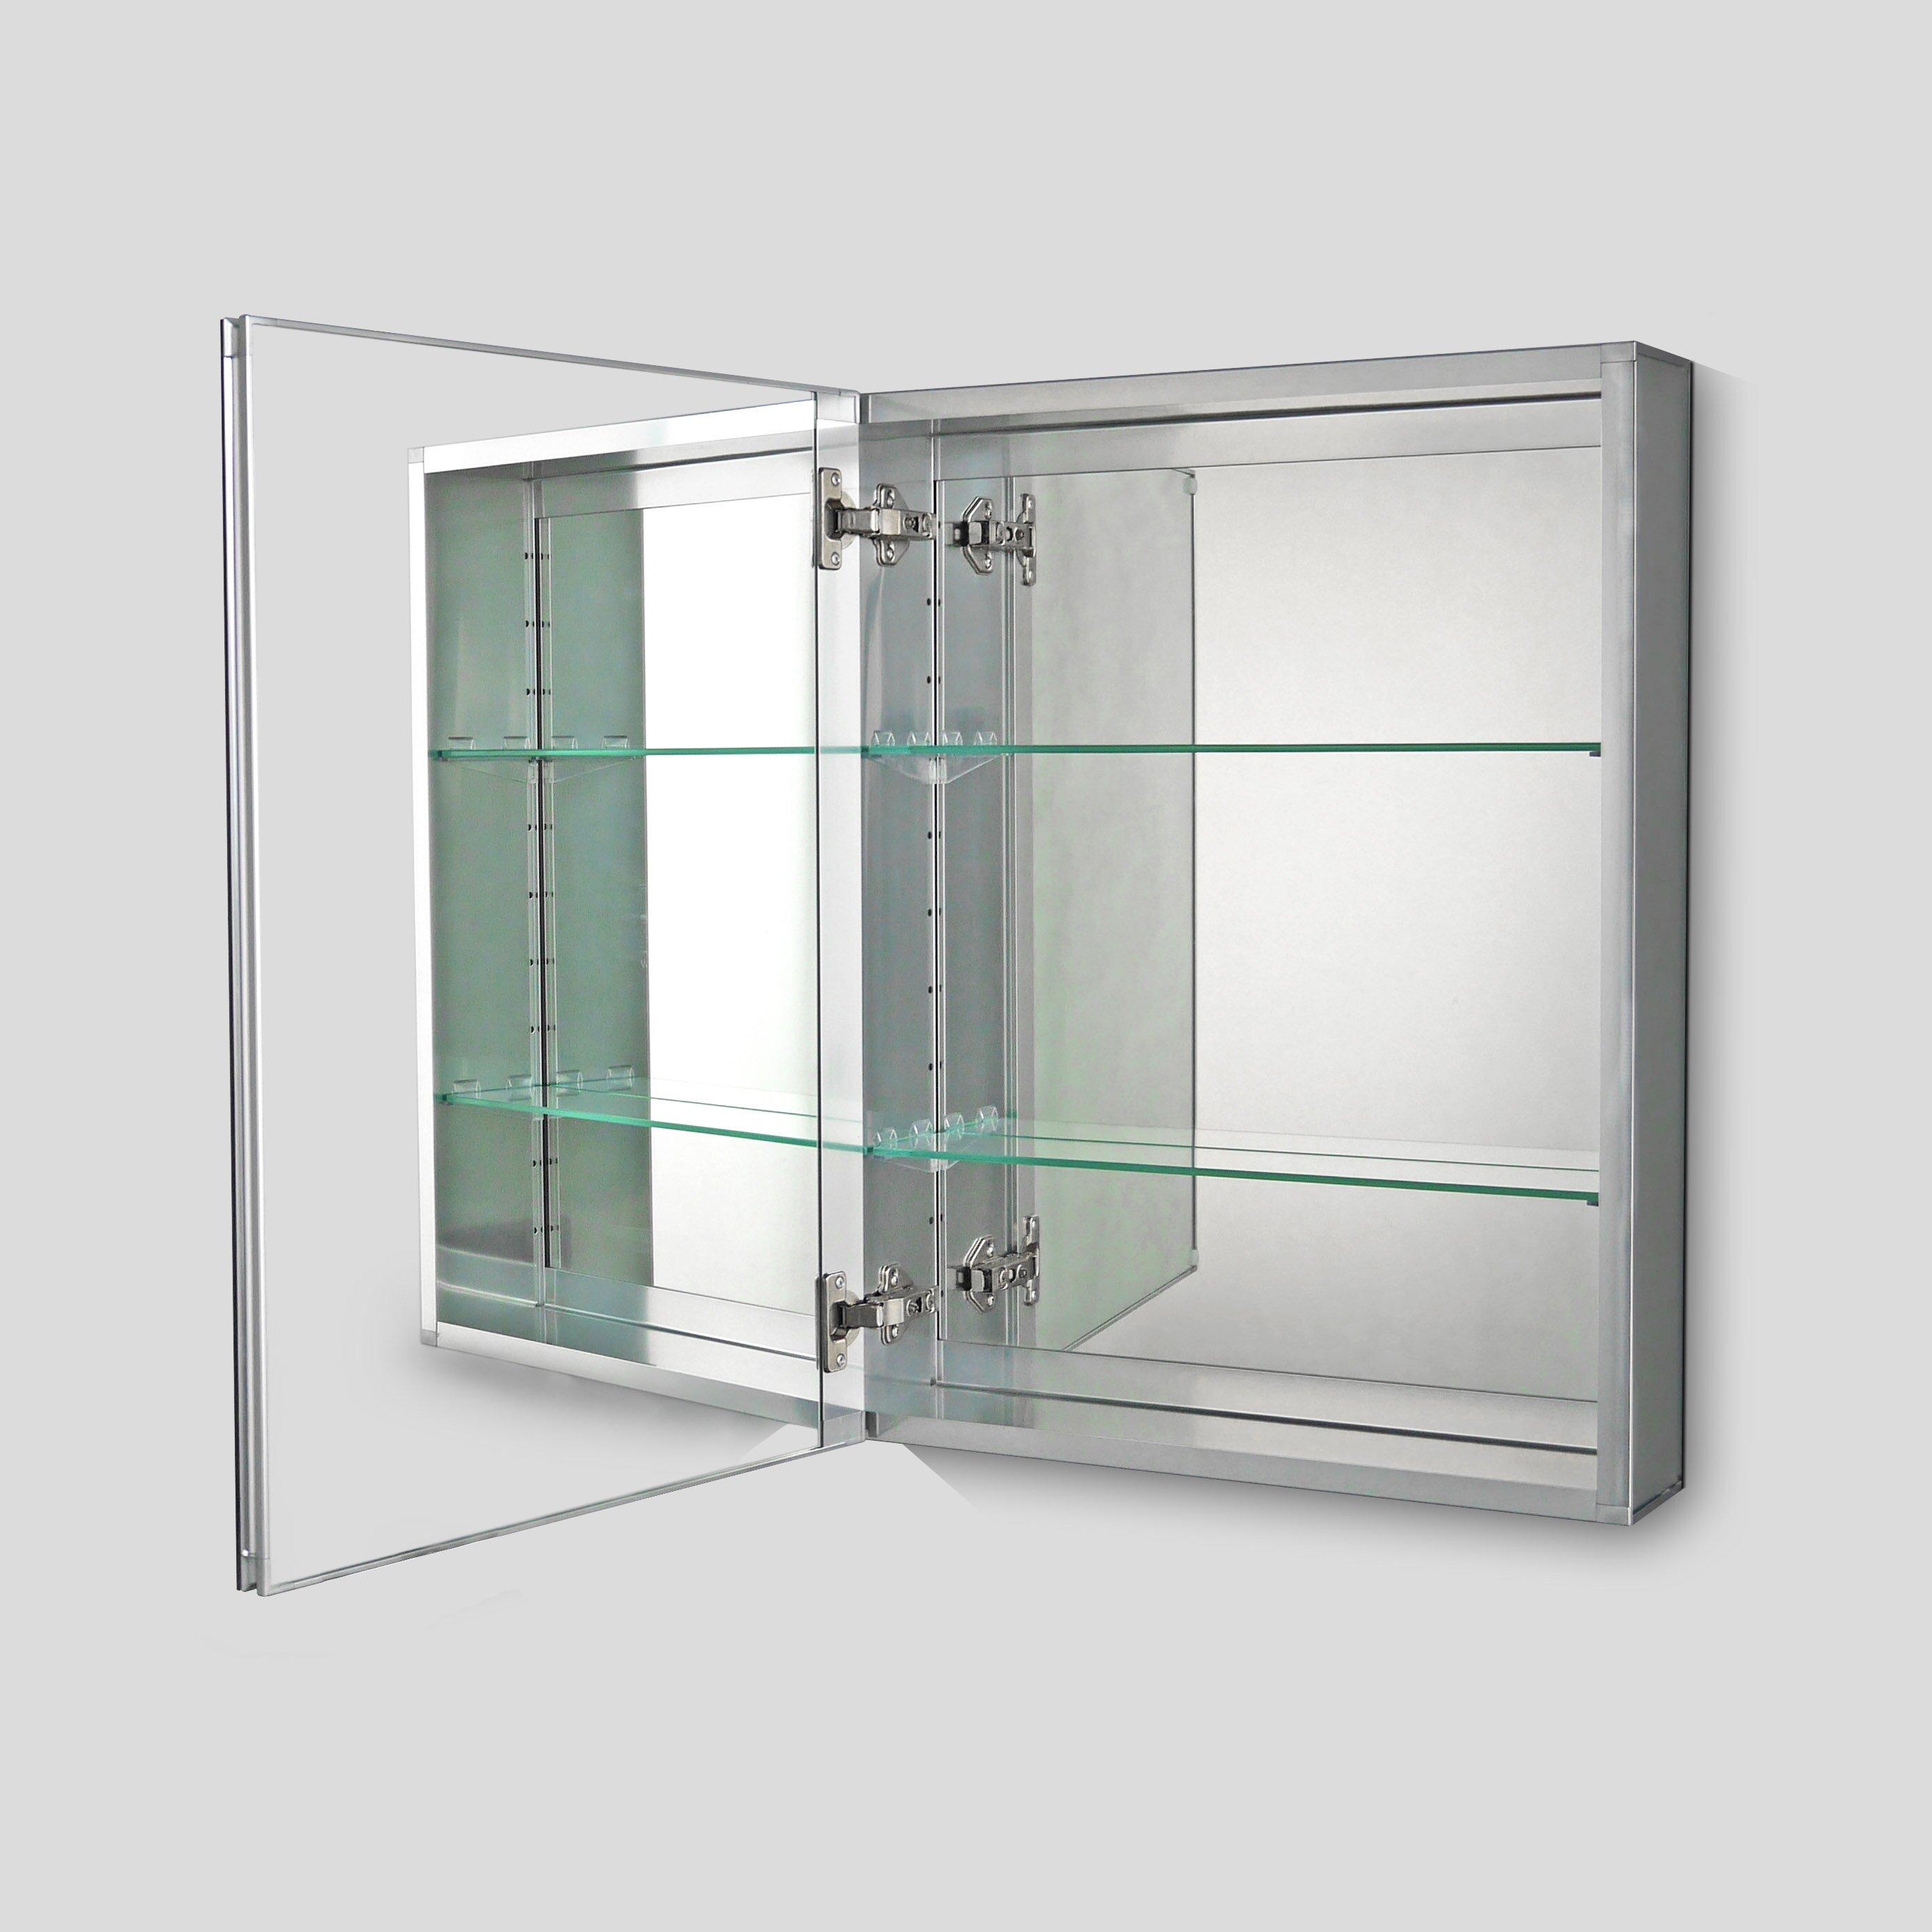 24 X 36 Medicine Cabinet Ketcham Medicine Cabinets 24 X 36 Surface Mount Medicine Cabinet